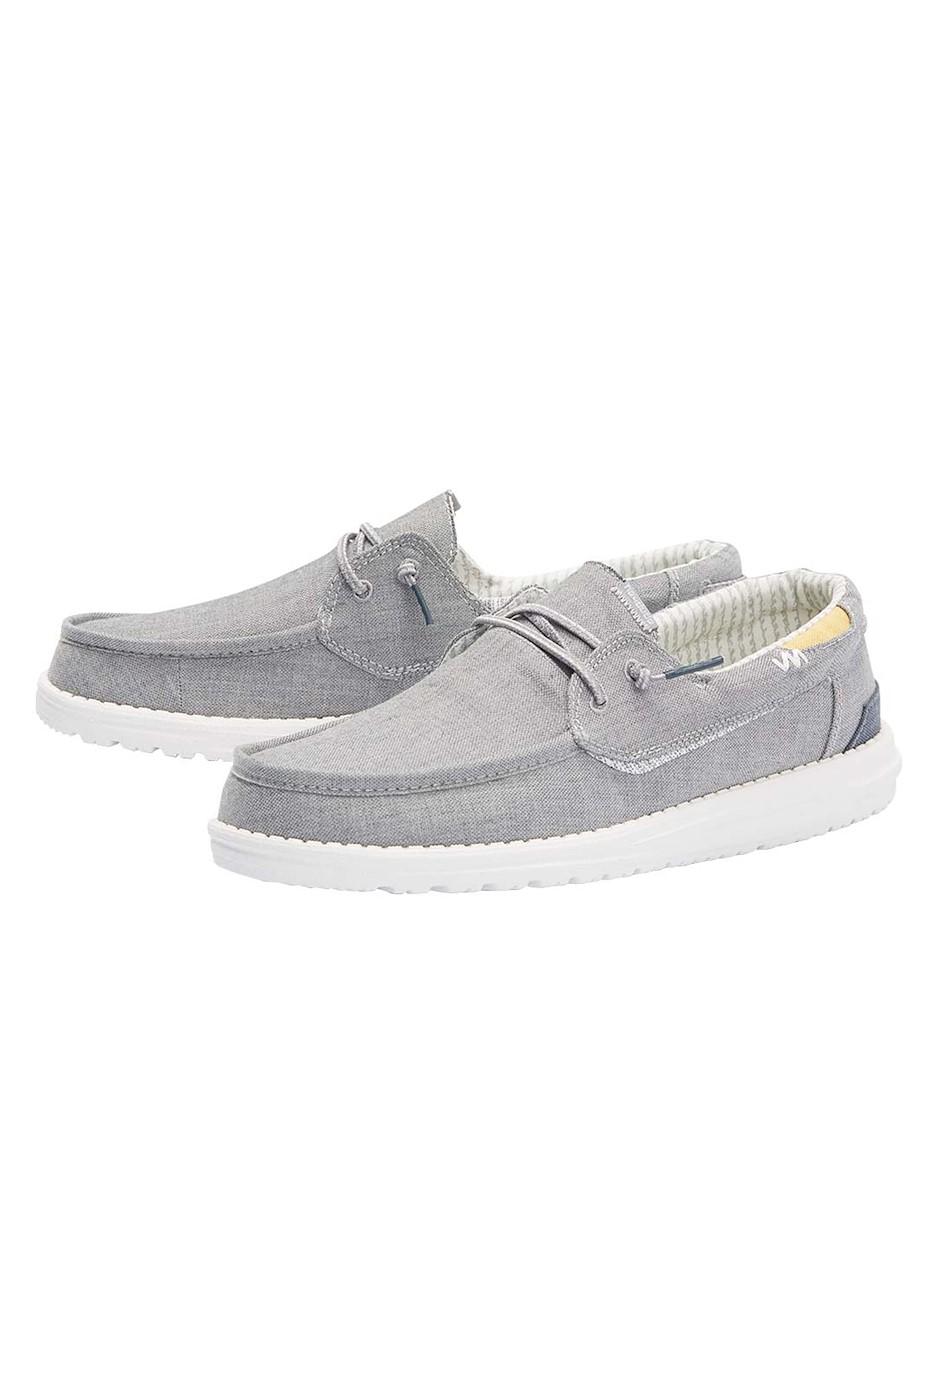 Hey Dude Walsh Cotton Upper Grey Deck Shoe Grey